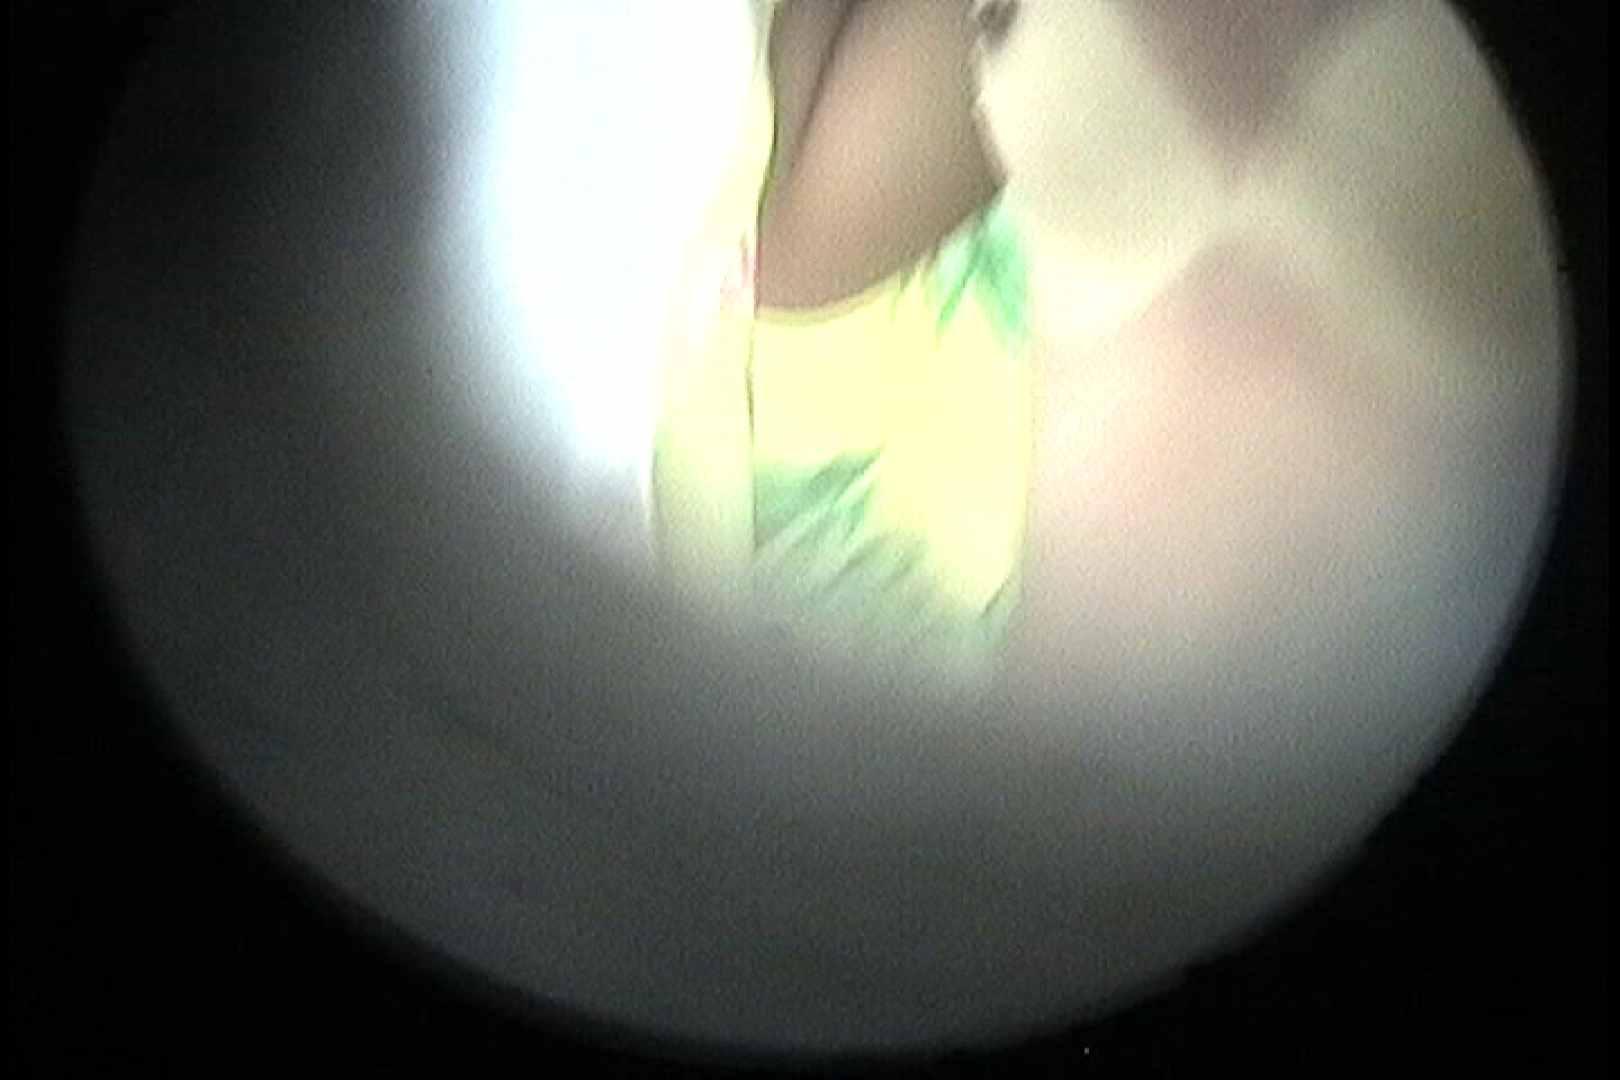 No.22 日焼け跡とオッパイの関係がおかしな貧乳ギャル ギャルハメ撮り  40Pix 24